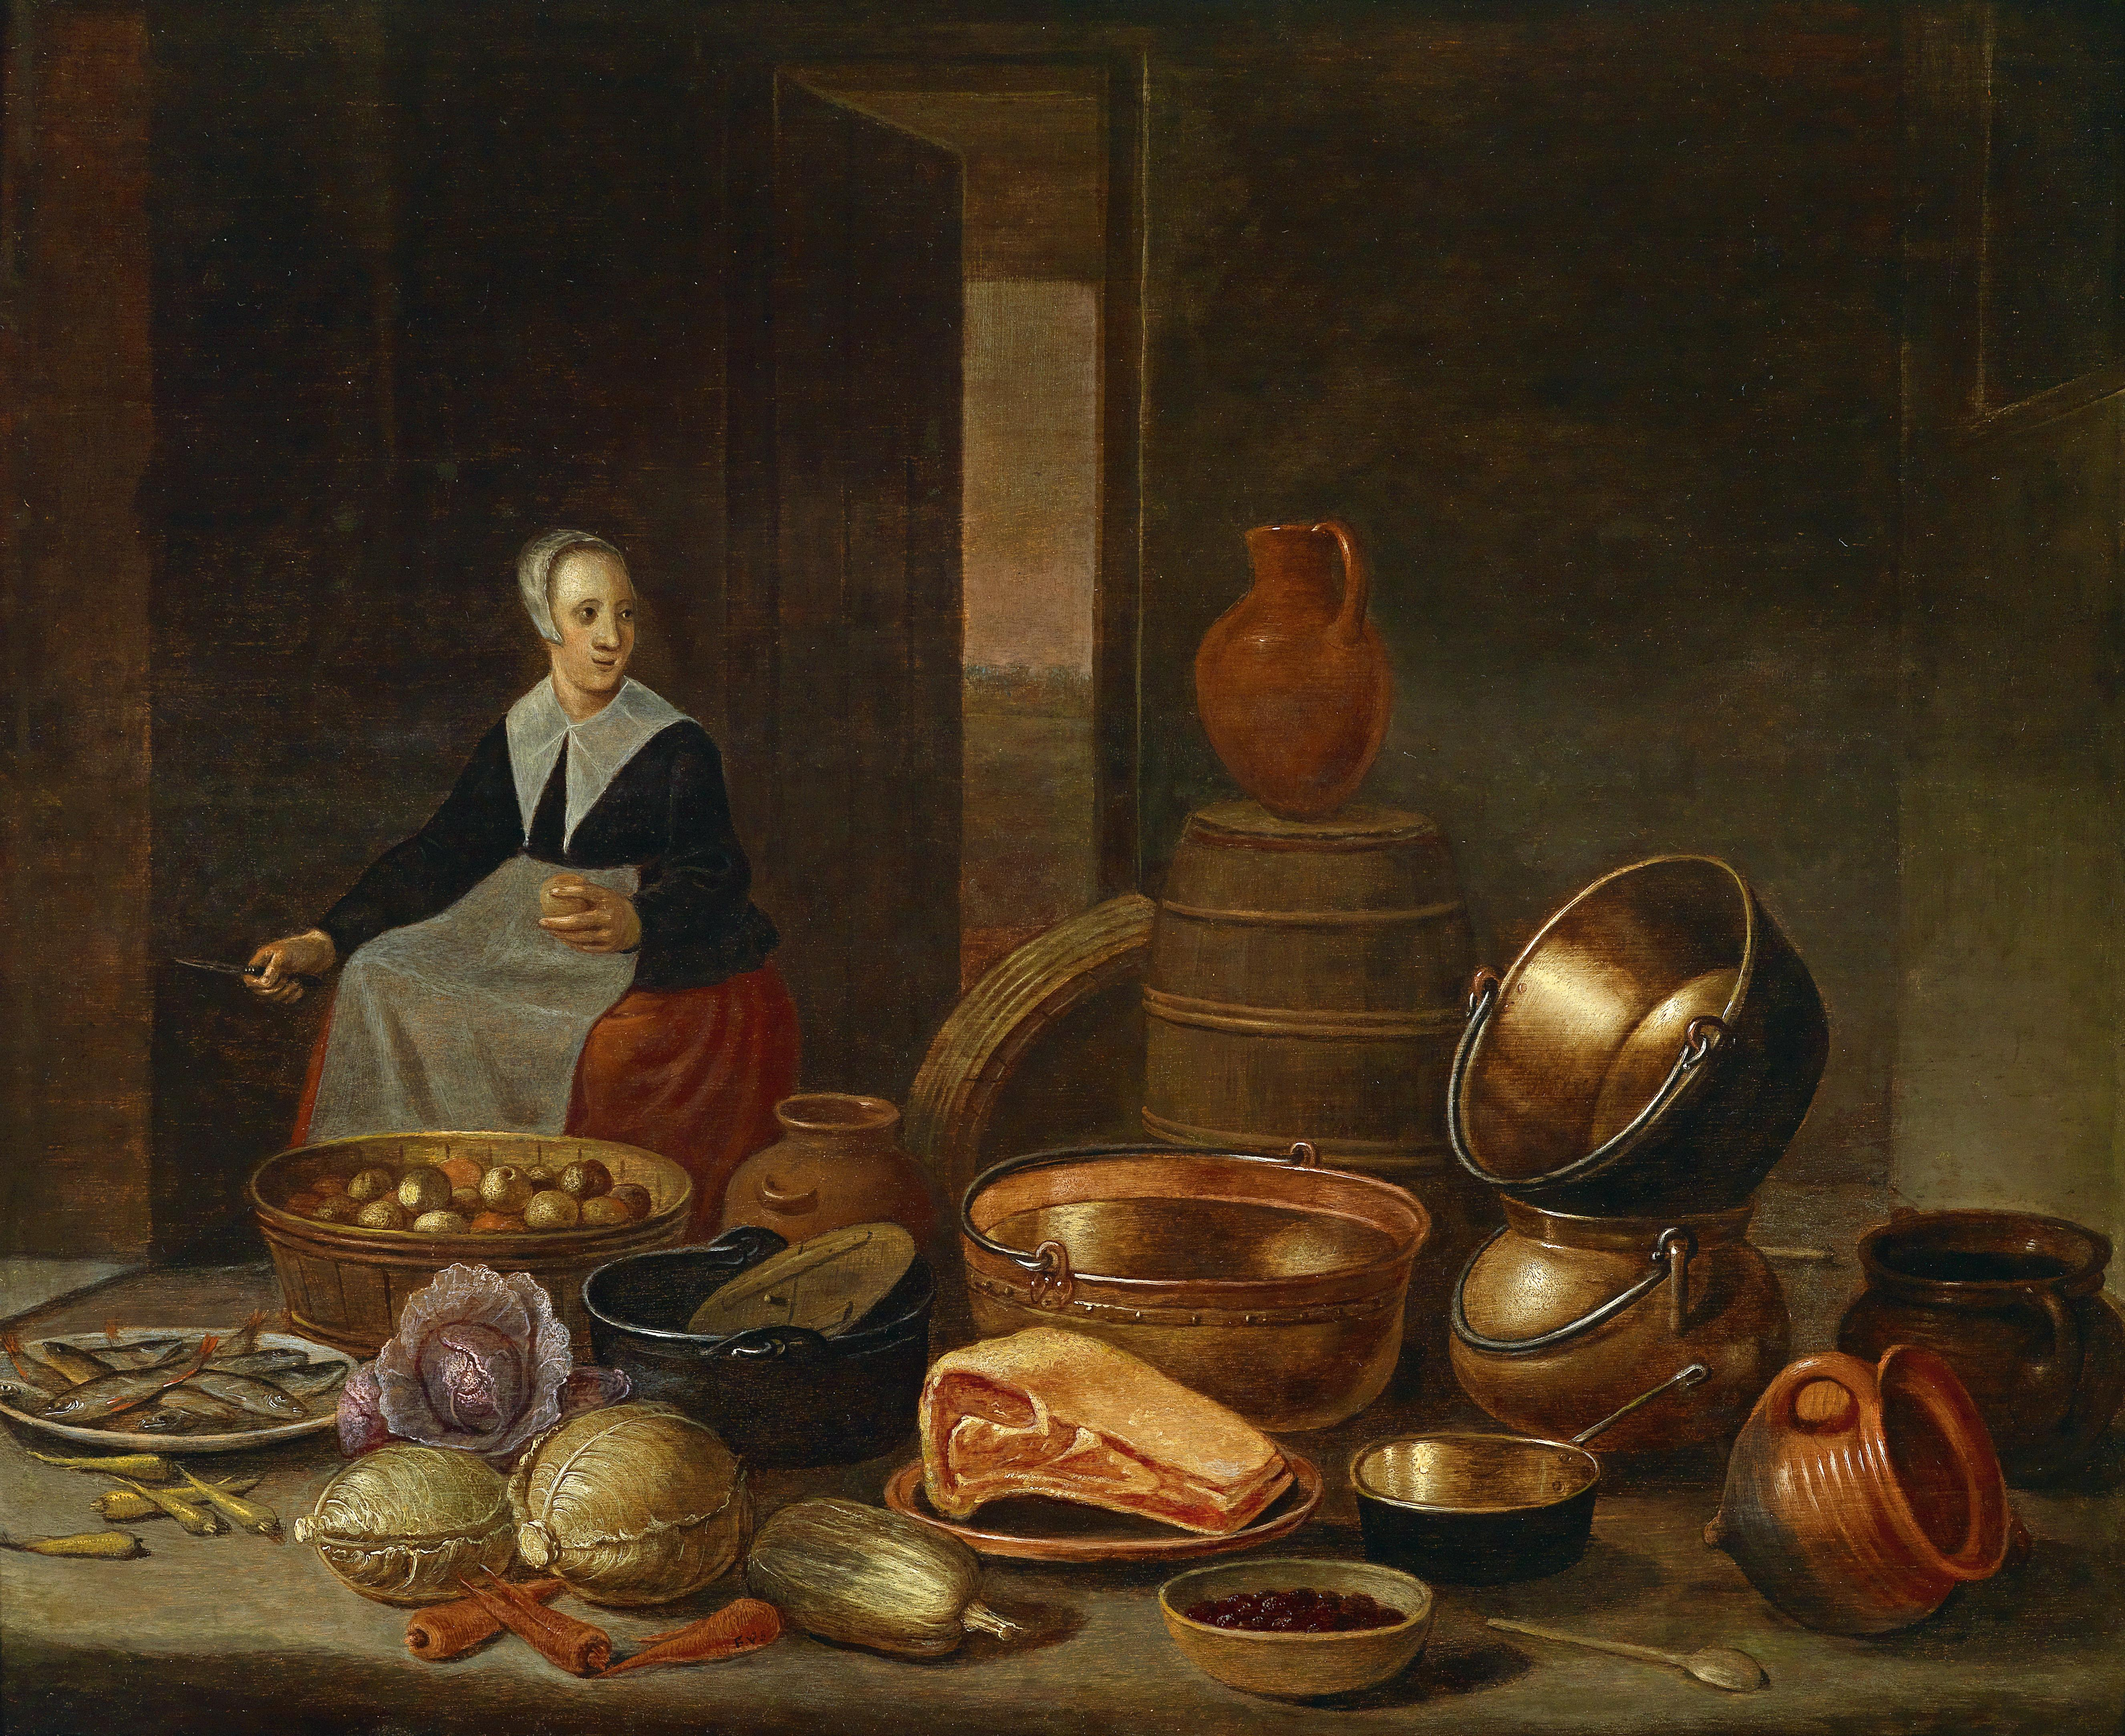 File:Floris van Schooten Kücheninterieur.jpg - Wikimedia Commons